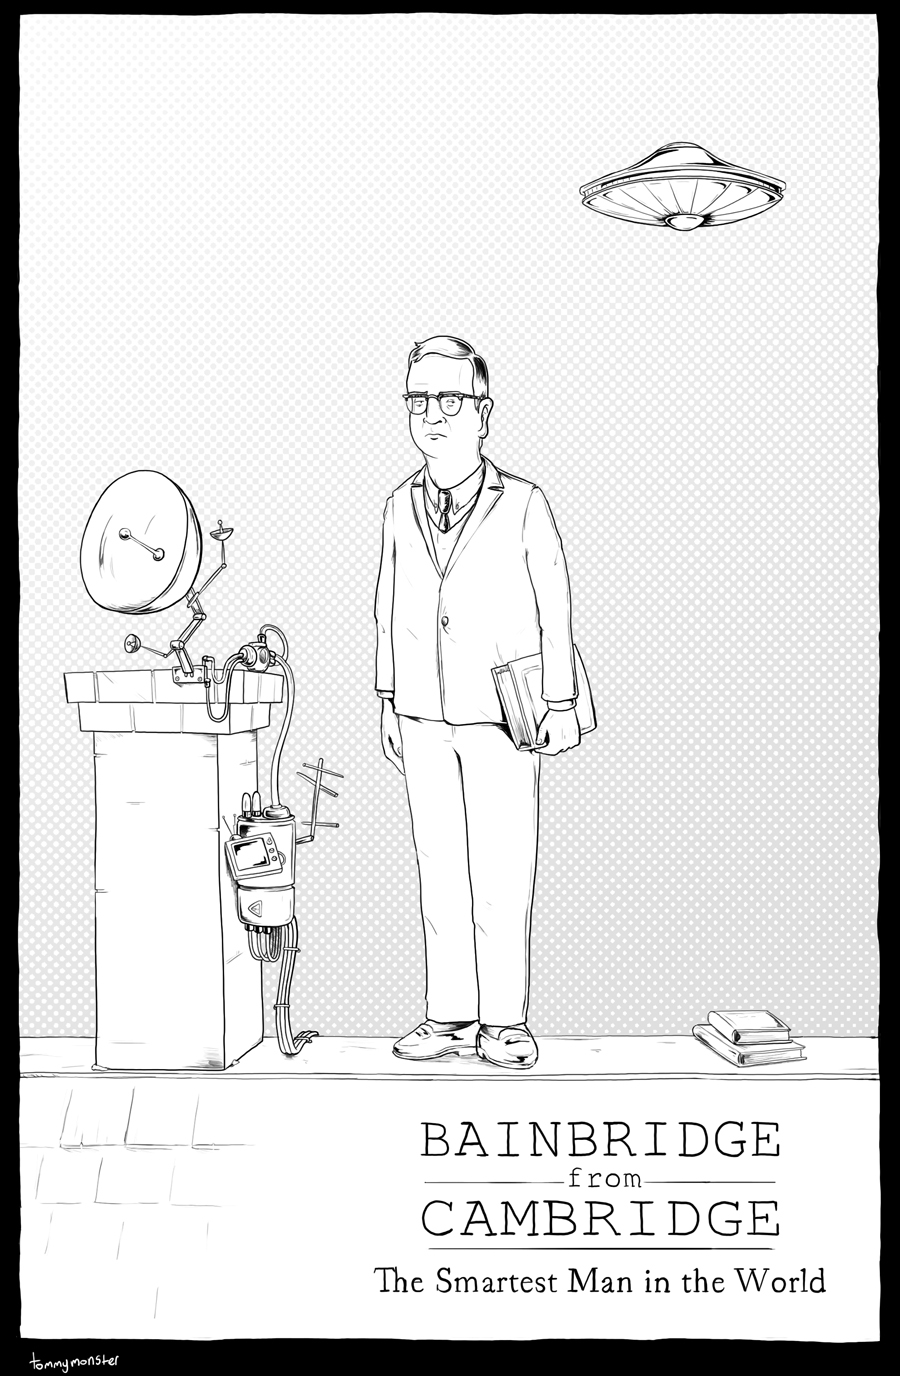 Bainbridge from Cambridge